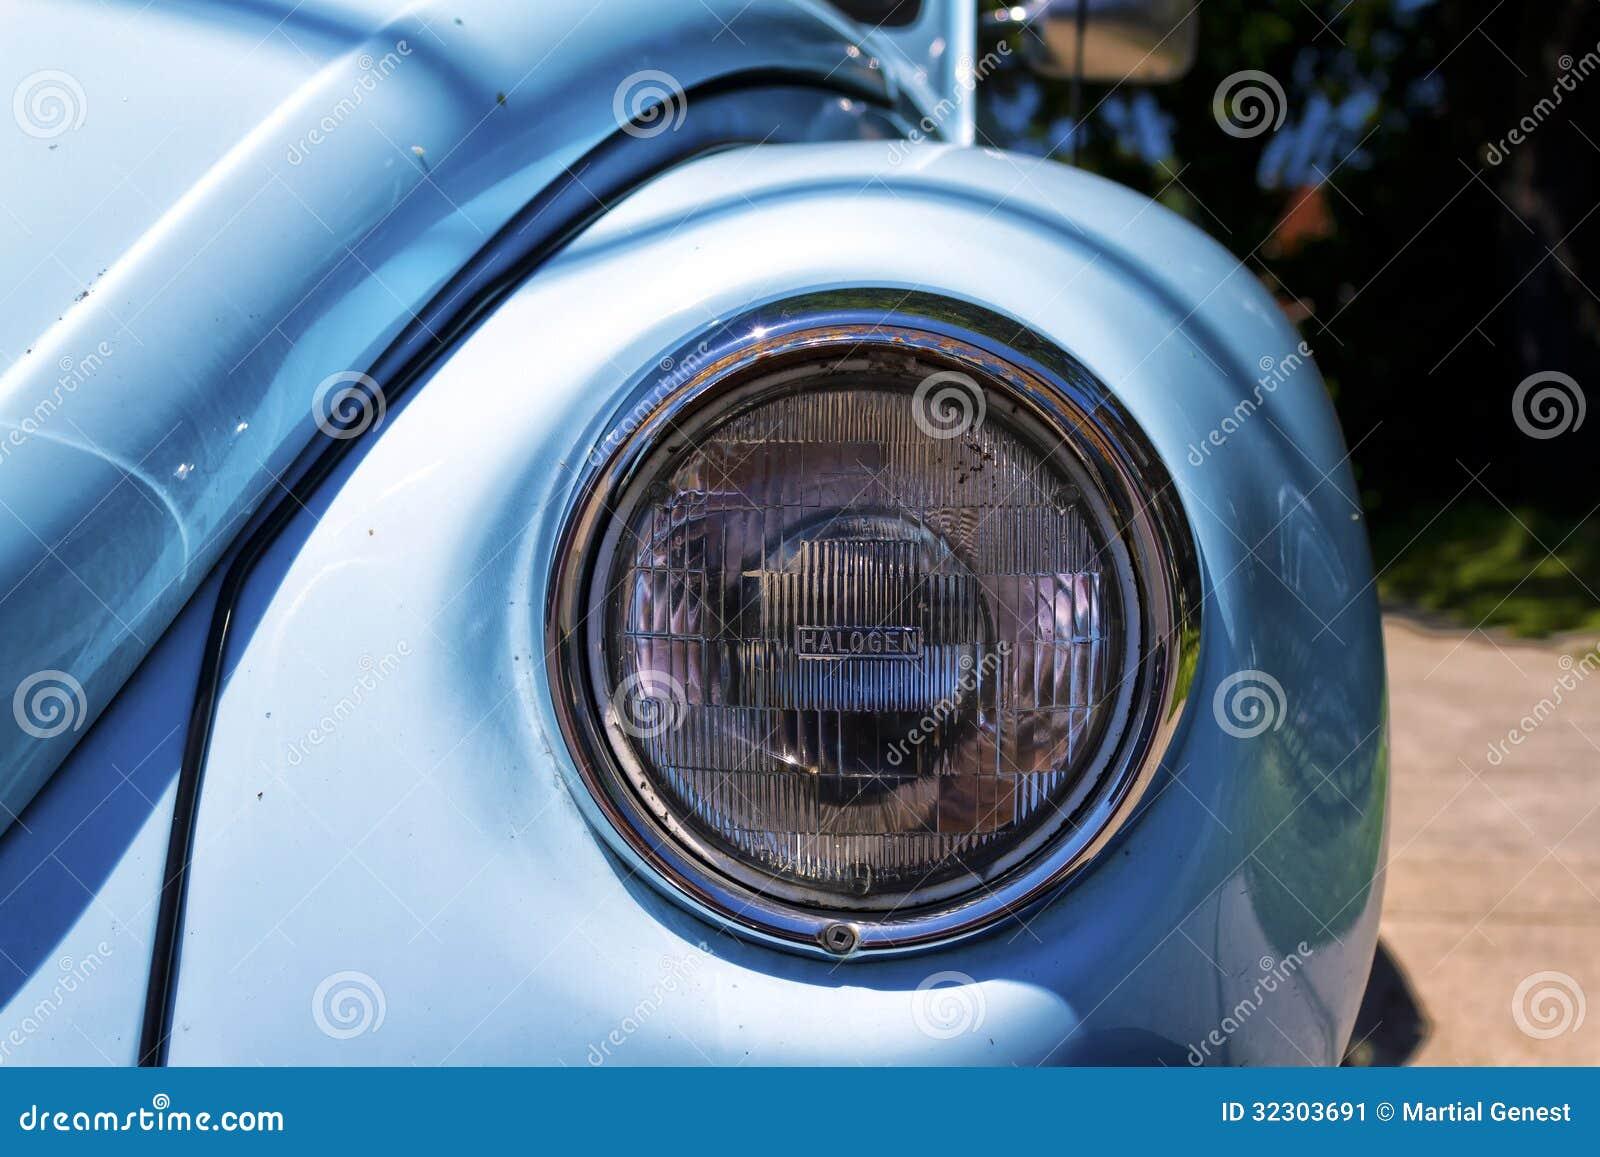 headlight stock image image 32303691. Black Bedroom Furniture Sets. Home Design Ideas